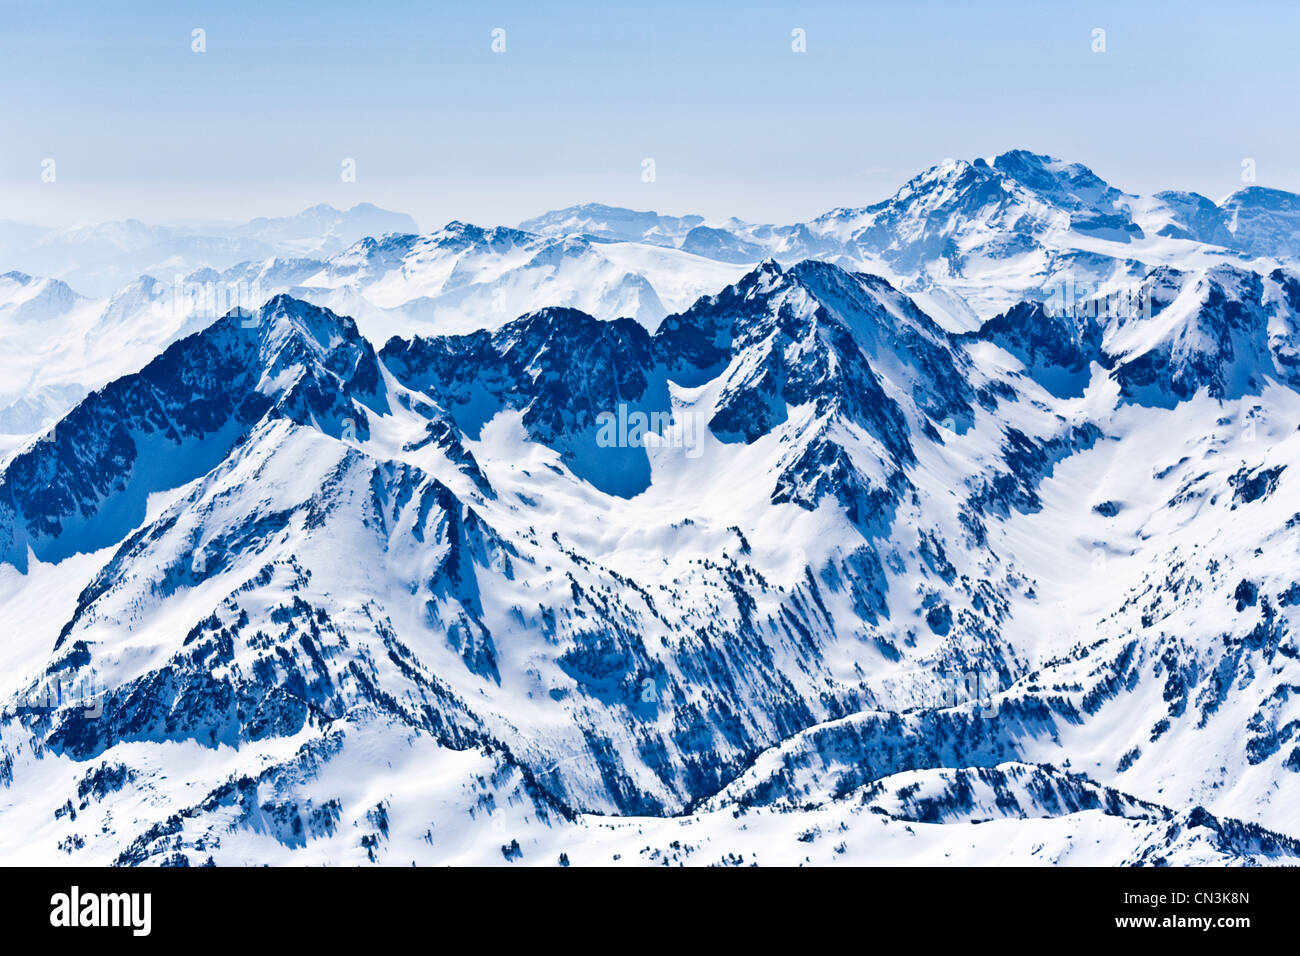 France, Hautes Pyrenees, Bagneres de Bigorre, near the Pic du Midi (aerial view) - Stock Image